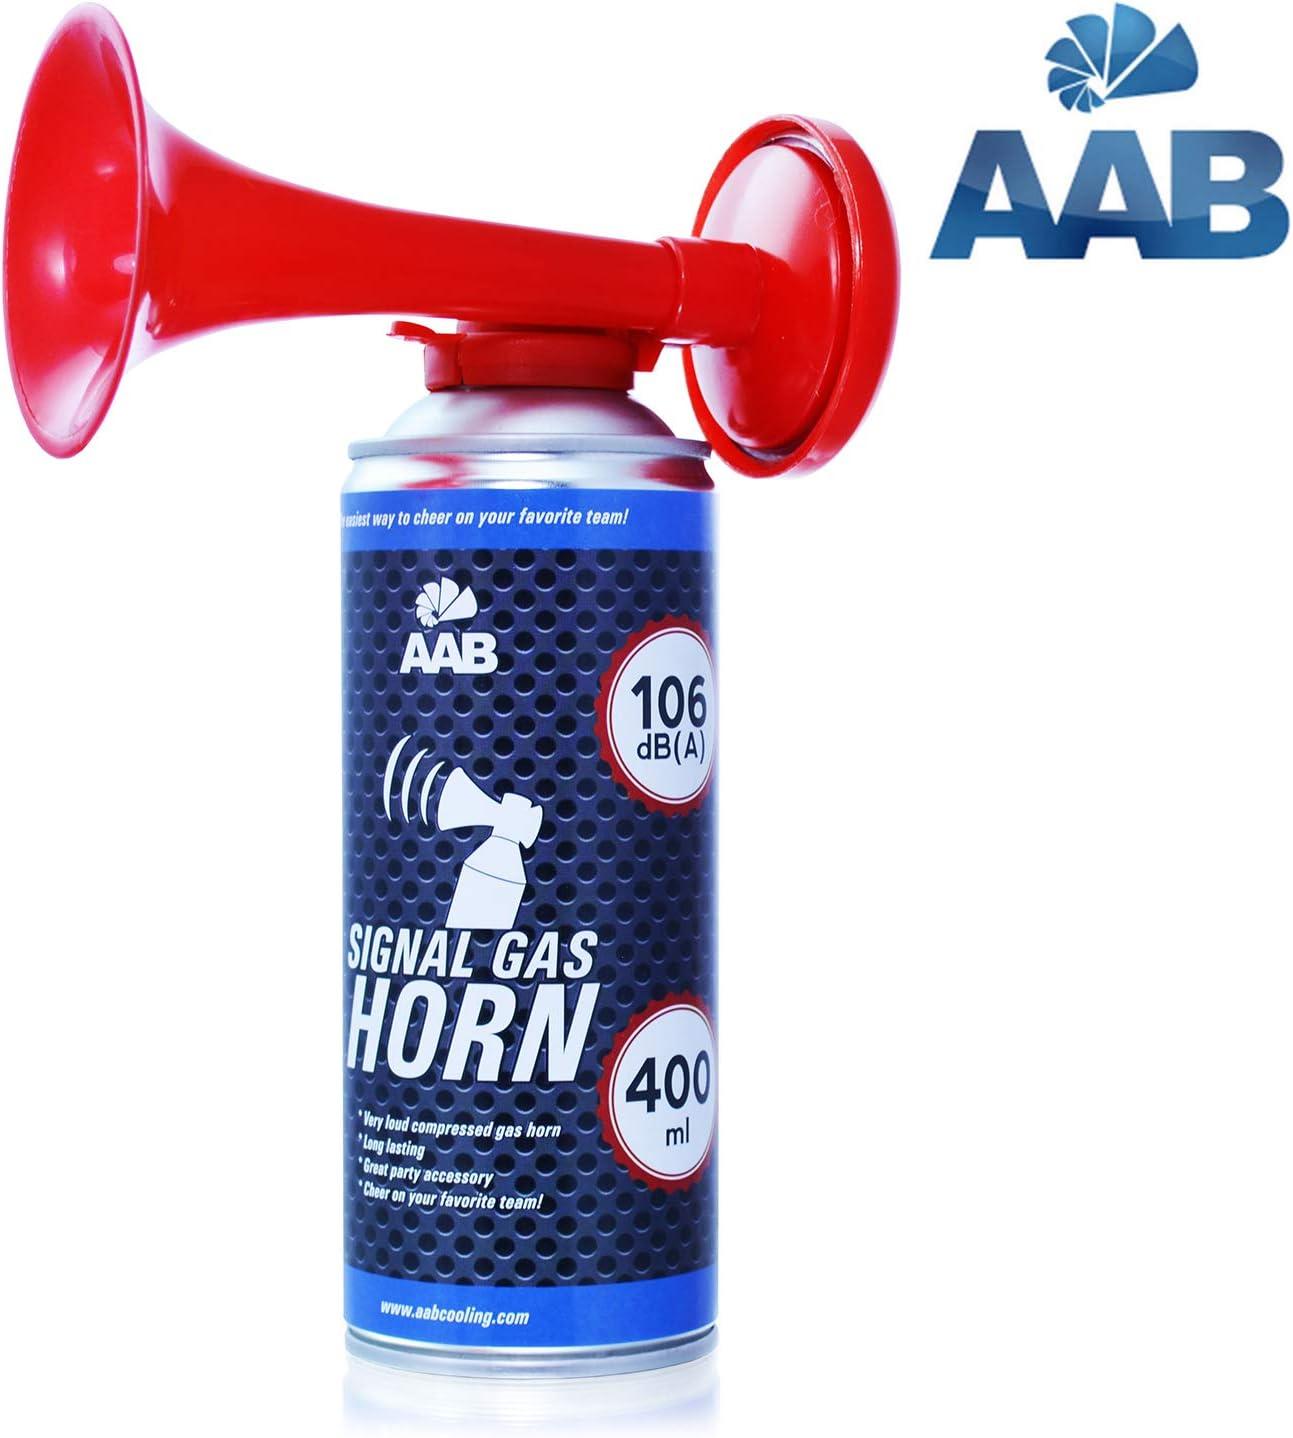 AAB Cooling Signal Gas Horn 400ml - Fanfarria de Gas Muy Fuerte, Butano, Bocina Aire Comprimido, Trompeta Bocina, Trompetas de Futbol